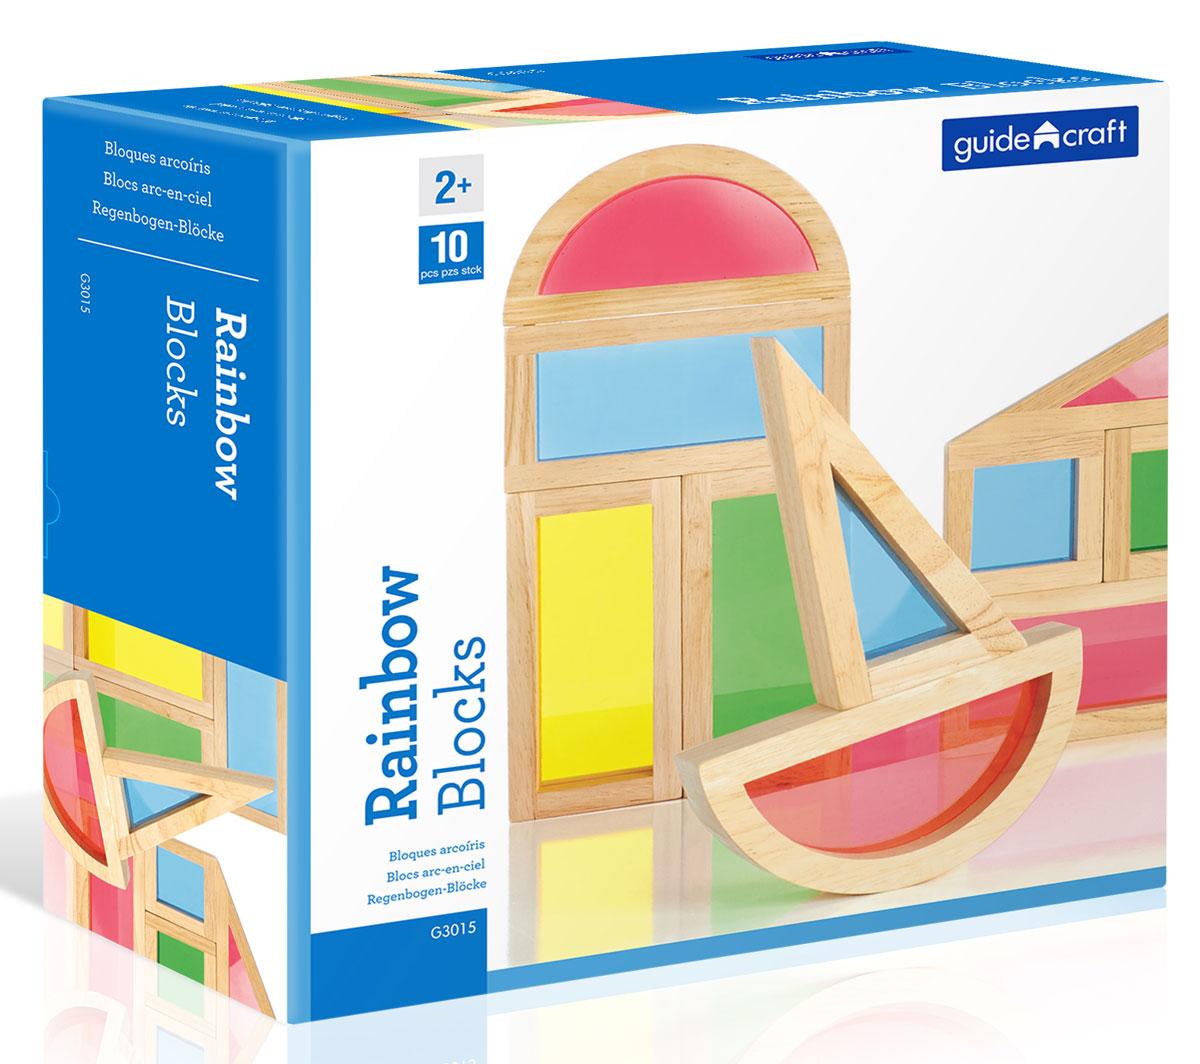 Guide Craft Конструктор Rainbow Blocks G3015 guide craft магнитный конструктор better builders career people